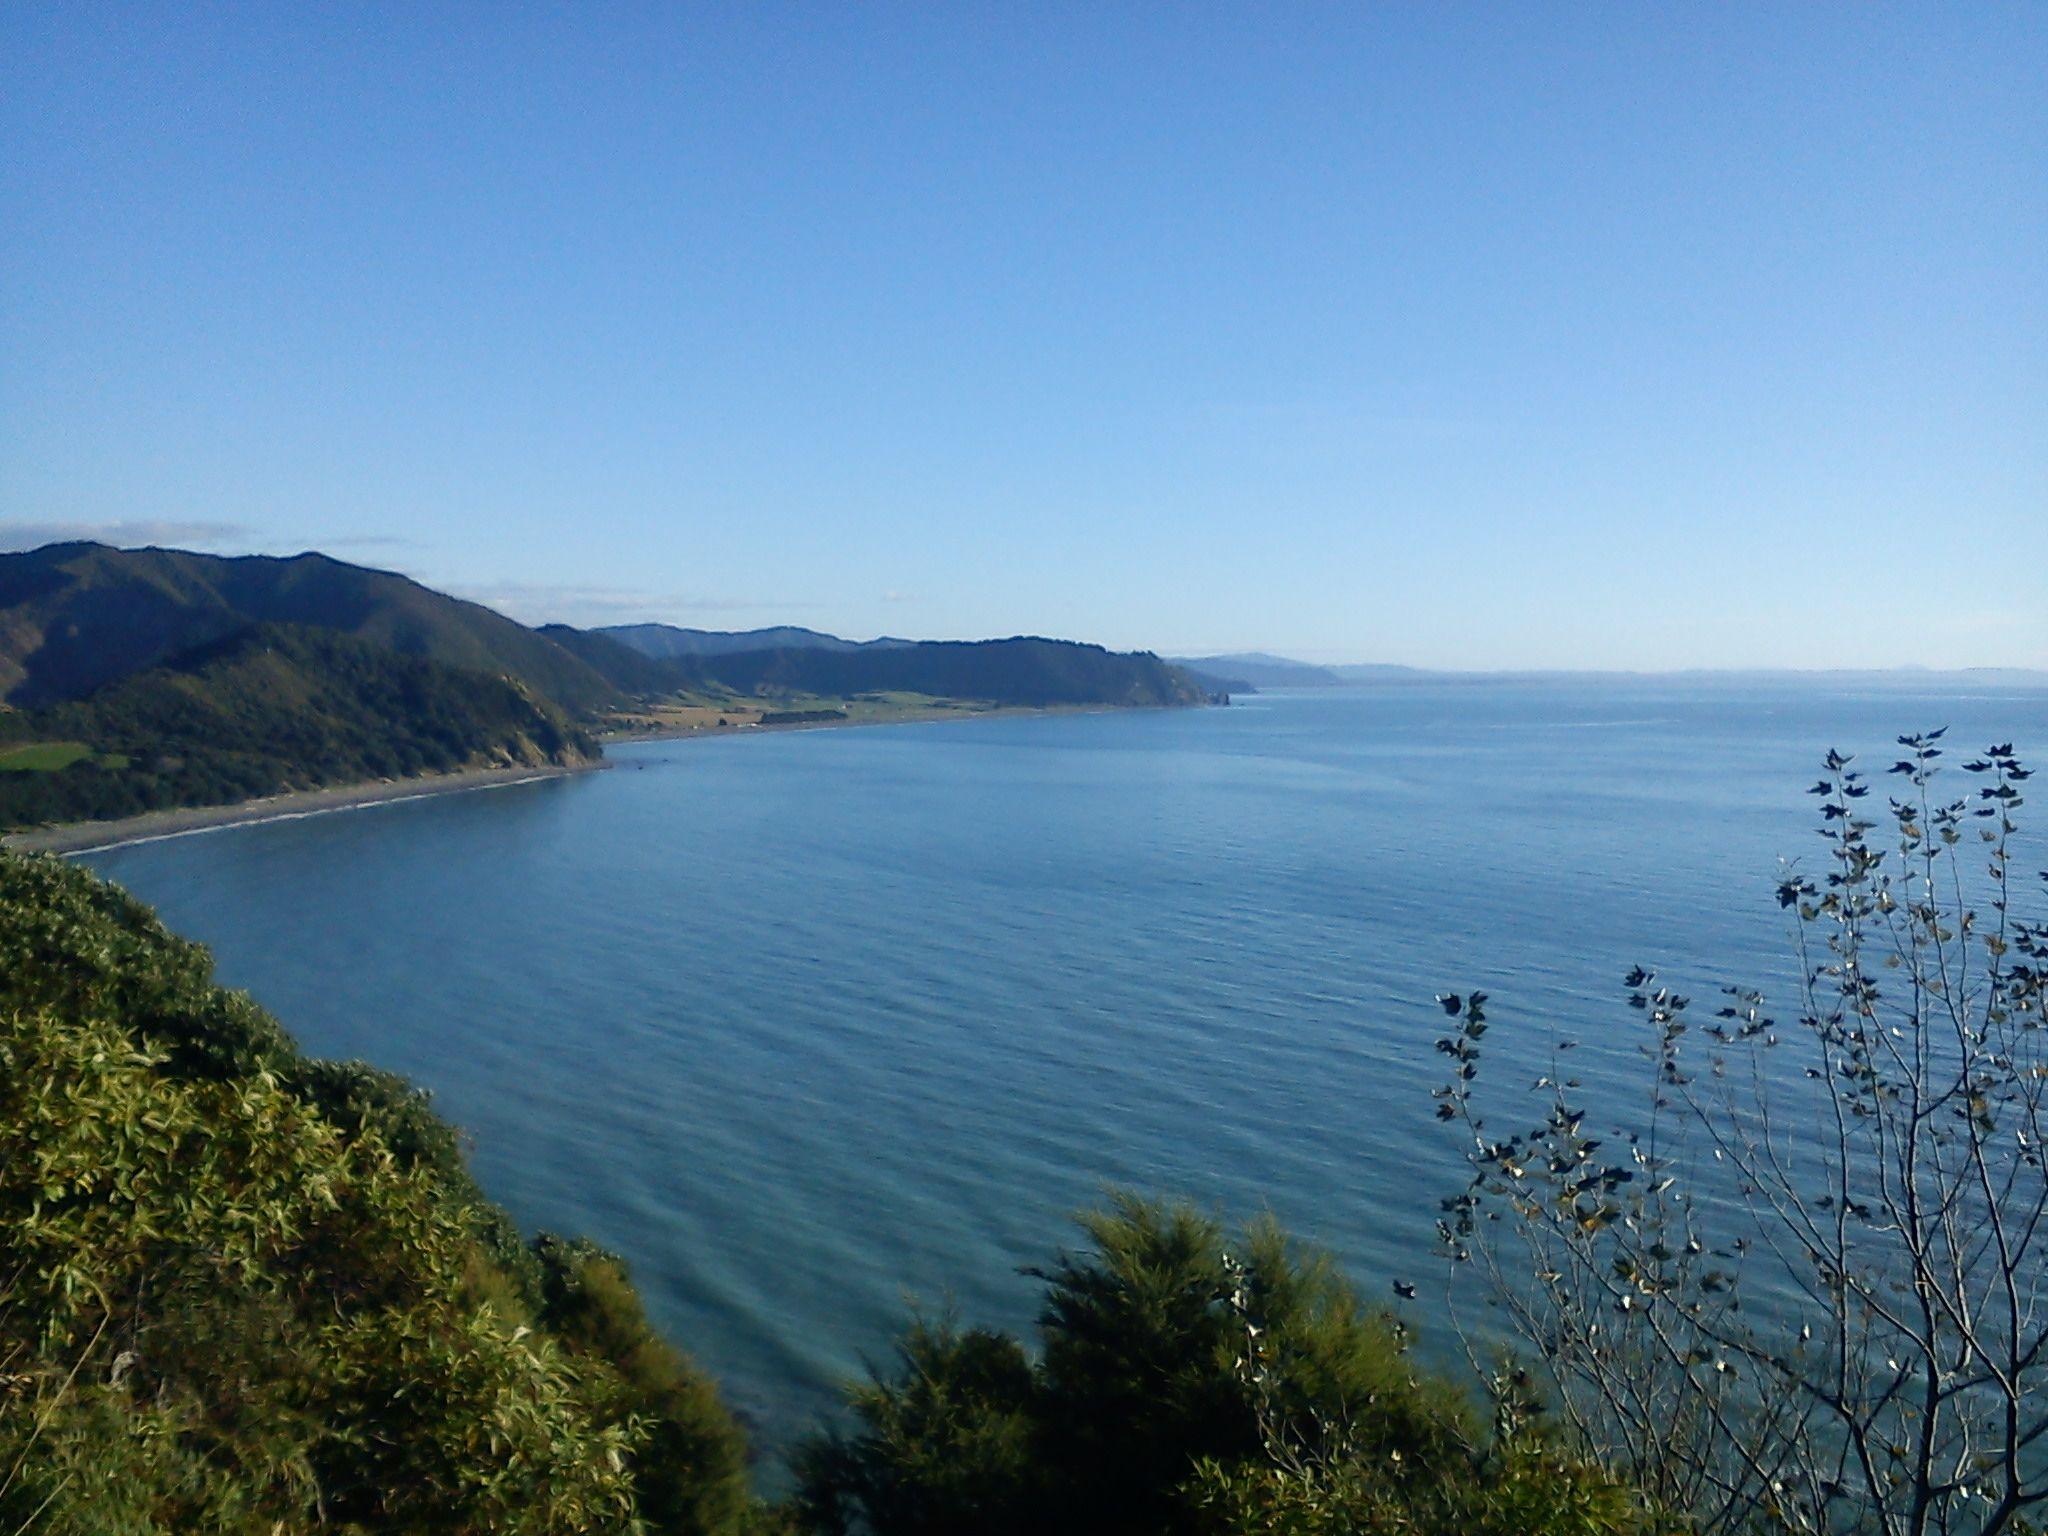 East Coast, between Opotiki and Maraenui, North Island, NZ by sanz r